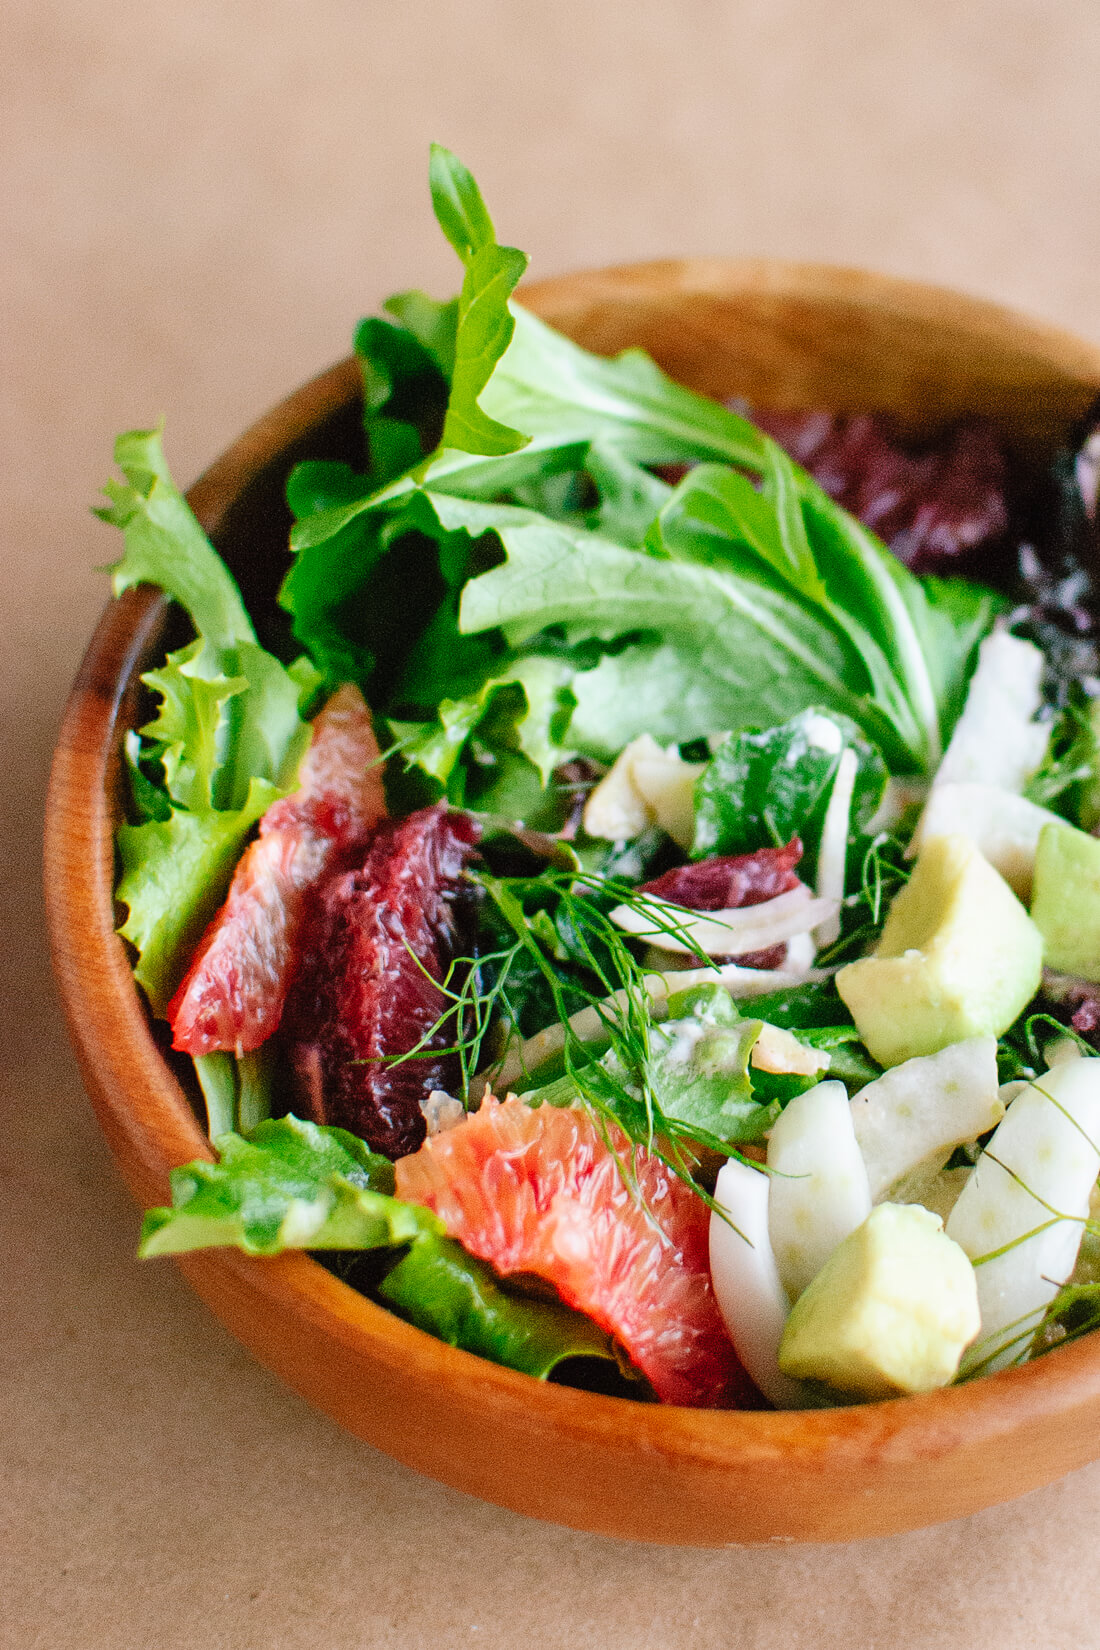 Blood Orange, Fennel and Avocado Salad with Lemon Citronette